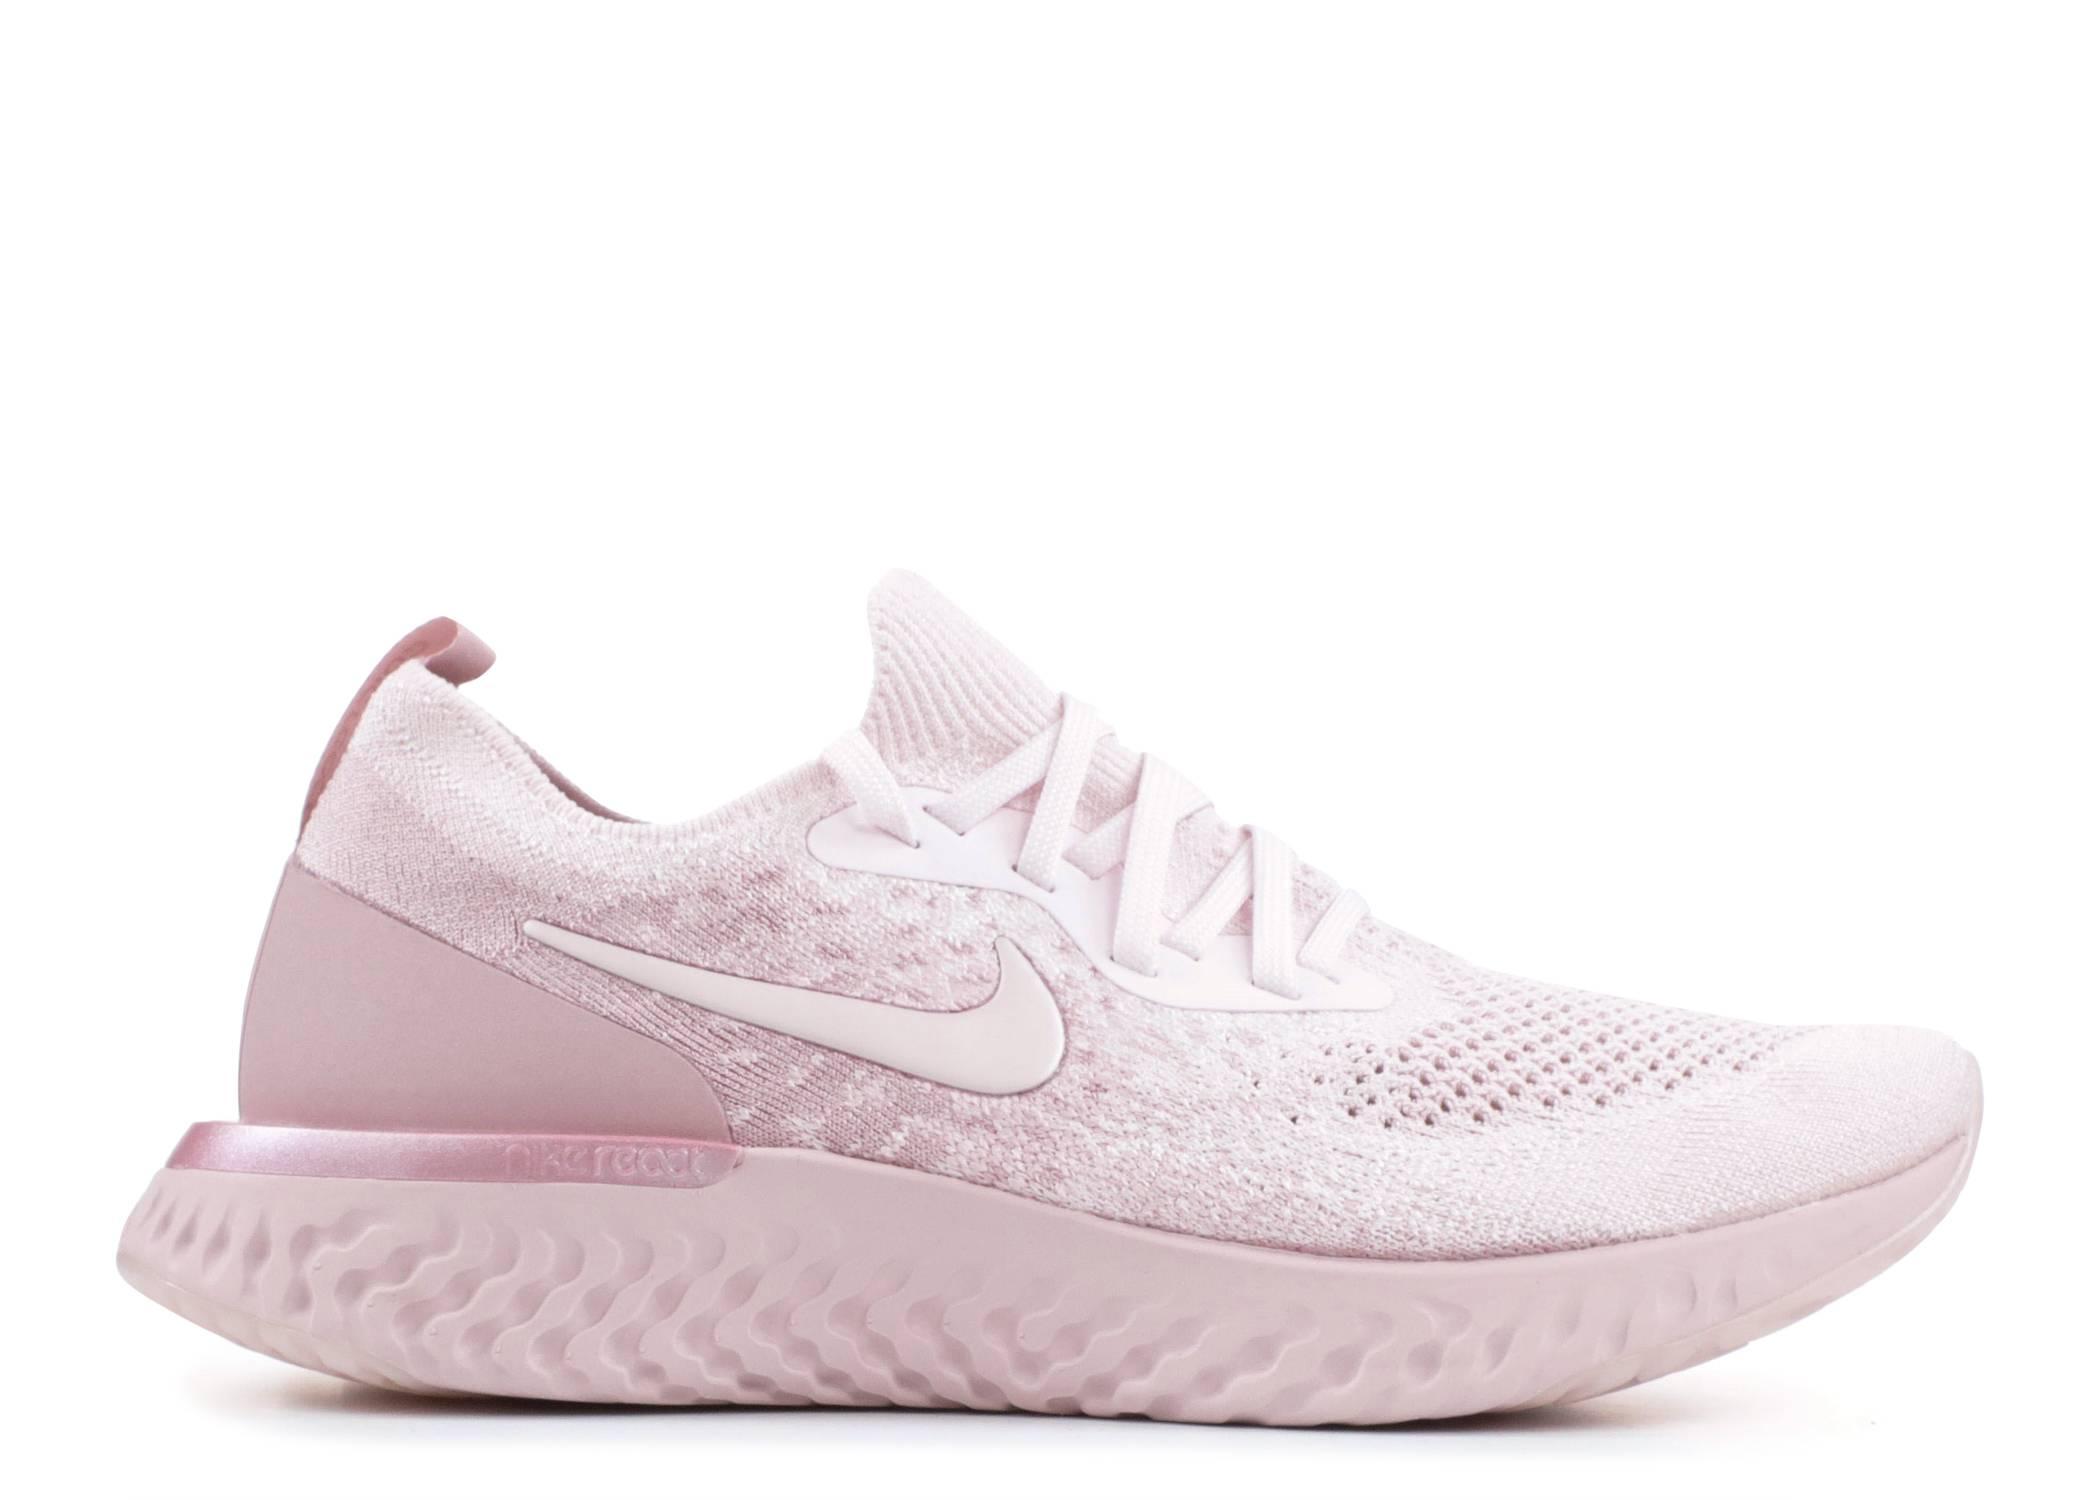 f193458277b3 WMNS Nike Epic React Flyknit - Nike - AQ0070 600 - pearl pink pearl pink